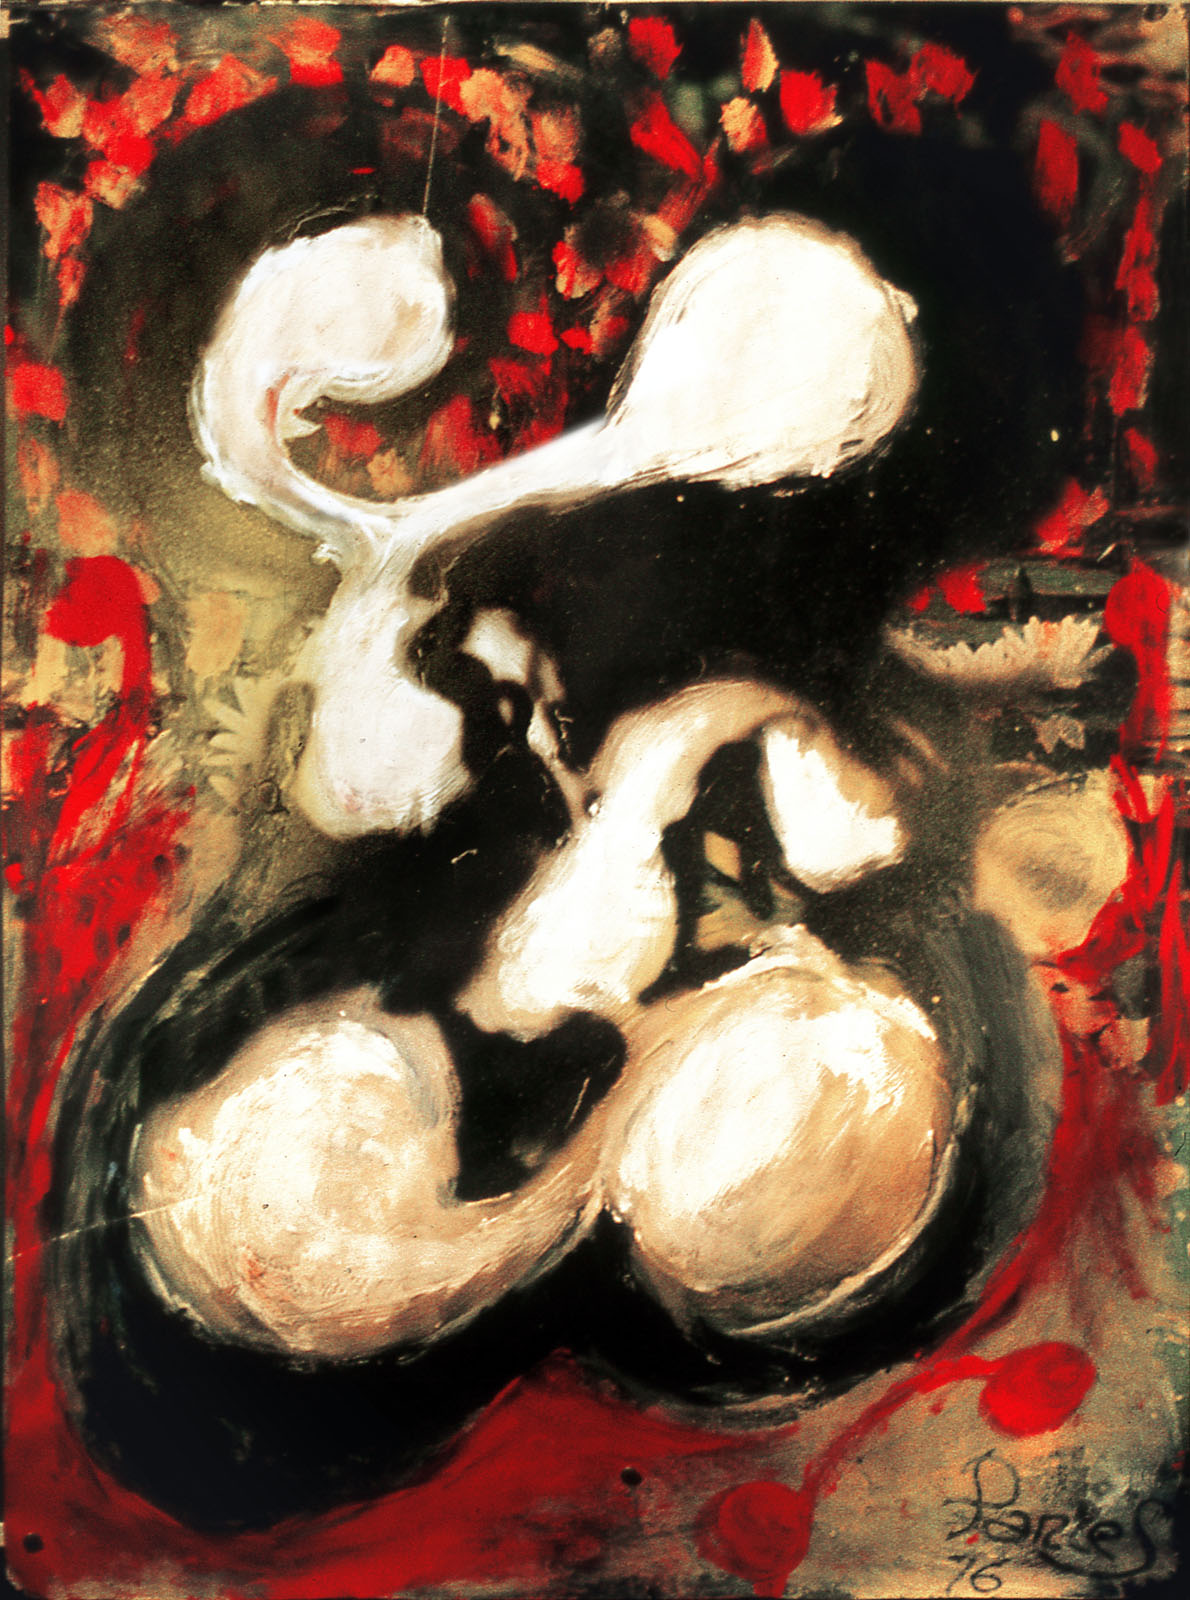 panies-danielvillalobos-spanish-painting-abstractexpressionism-3